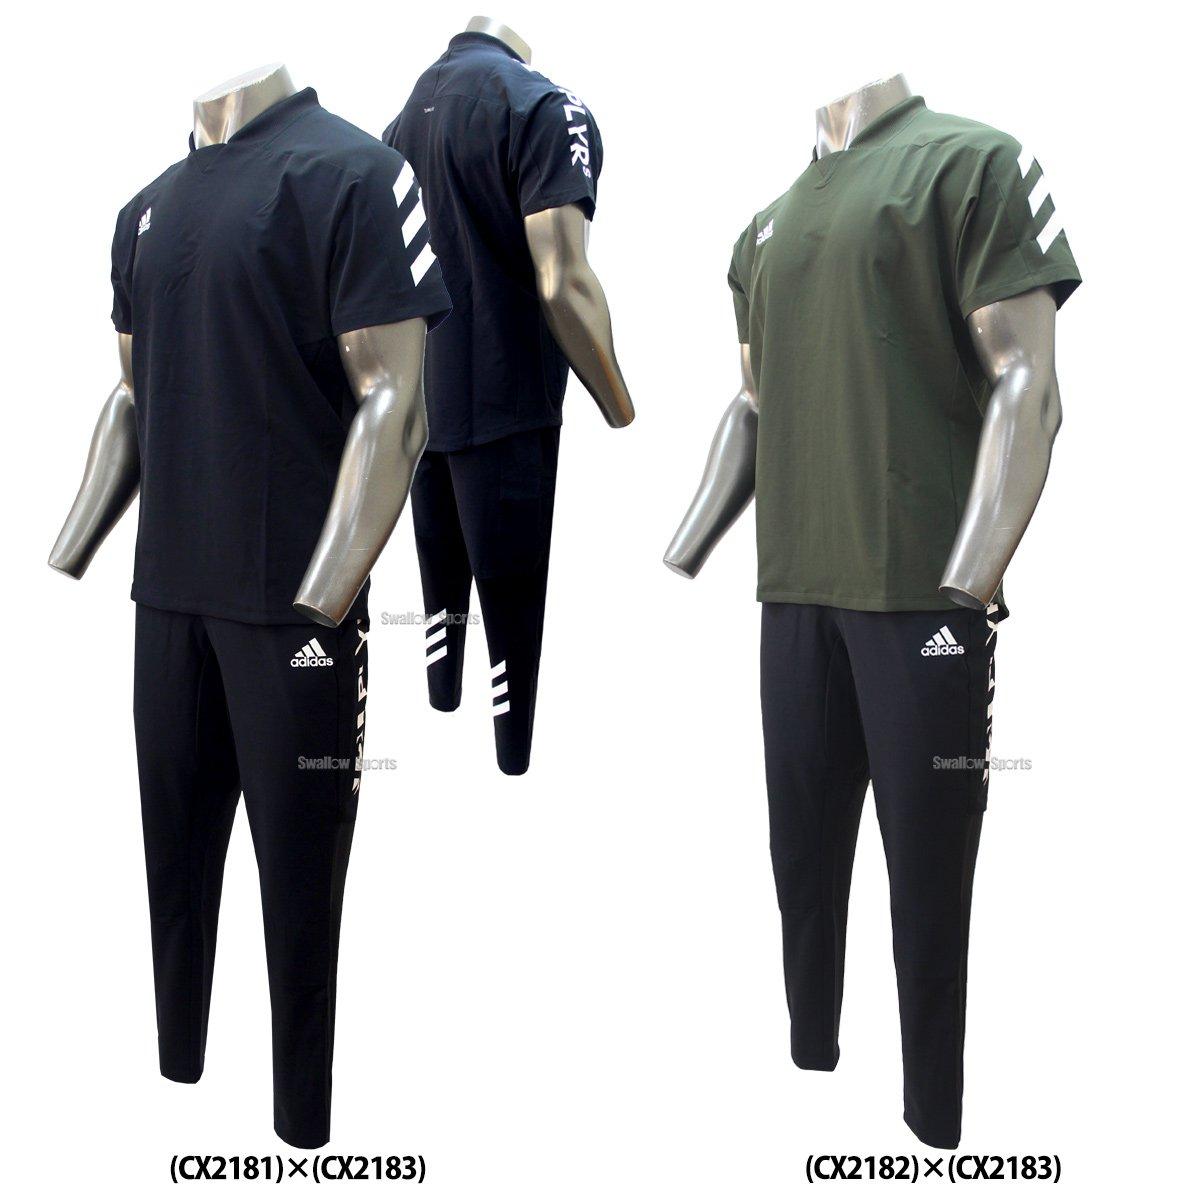 adidas アディダス ウェア 5T ハイブリッド 半袖 ジャケット パンツ 上下セット セットアップ ETX99-ETY02 B079XYSXTH J/L|(CX2182)×(CX2183) (CX2182)×(CX2183) J/L